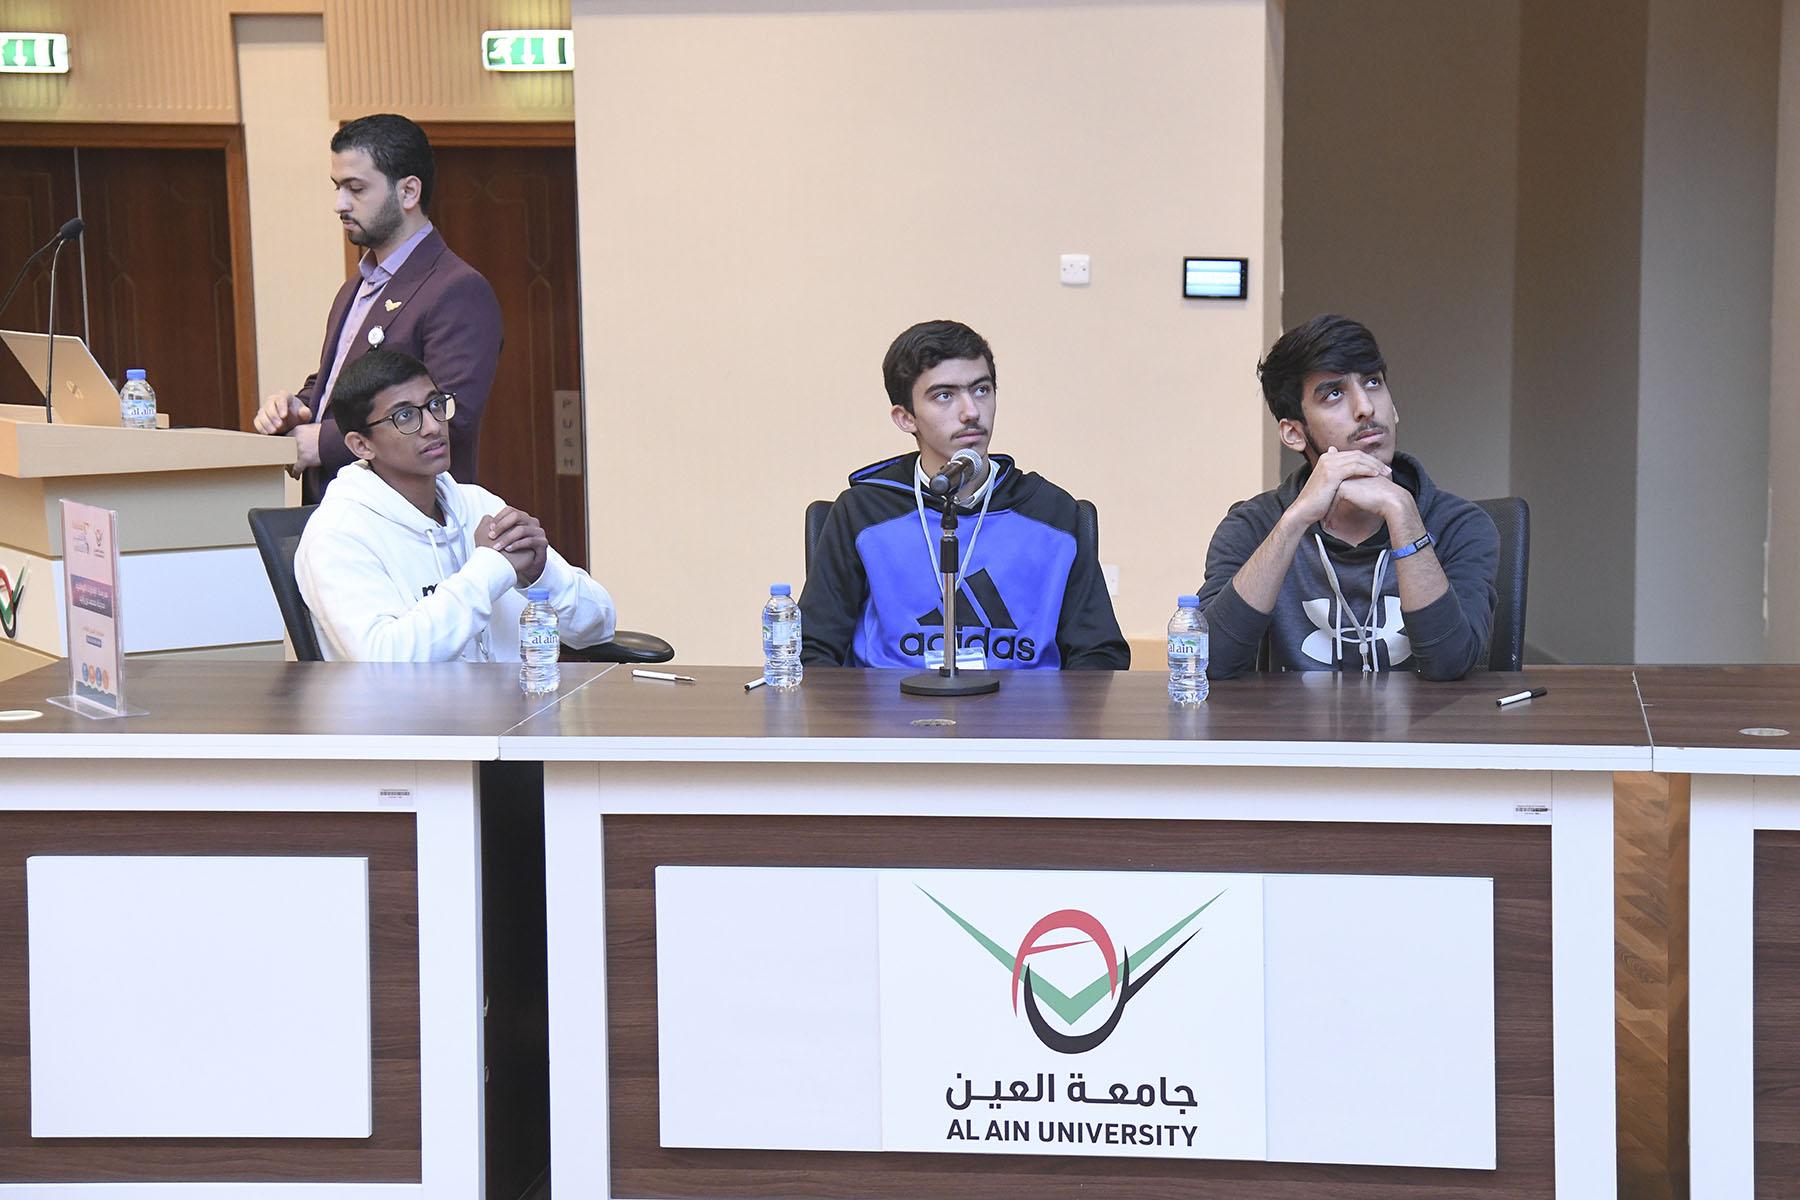 Ninth day (Ashbal Al Quds Private Secondary School VS Emirates National Schools - Mohamed Bin Zayed City)